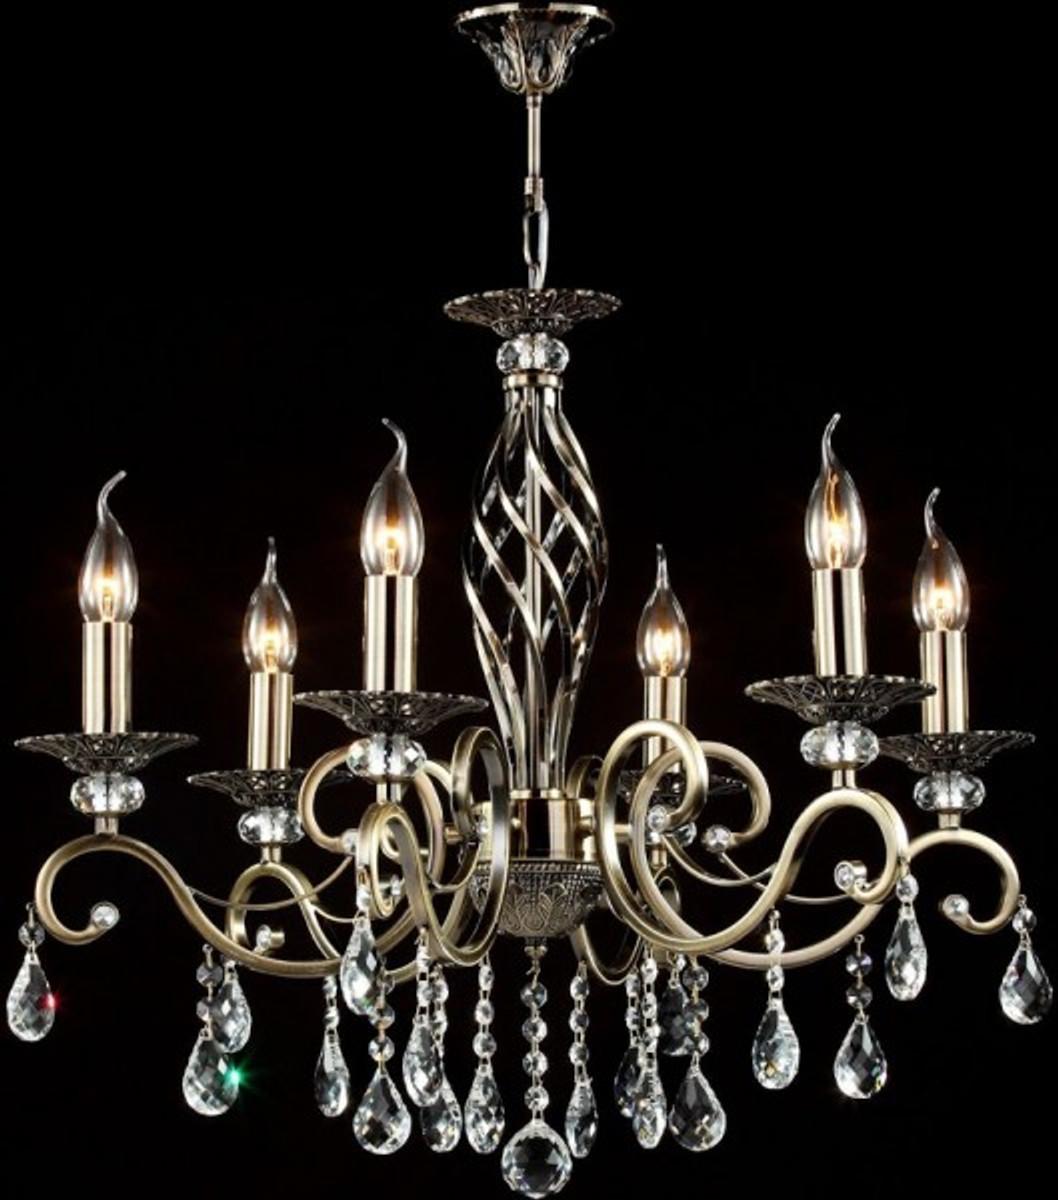 Casa Padrino Barock Kristall Decken Kronleuchter Bronze 63 X H 56 Cm Antik  Stil   Möbel